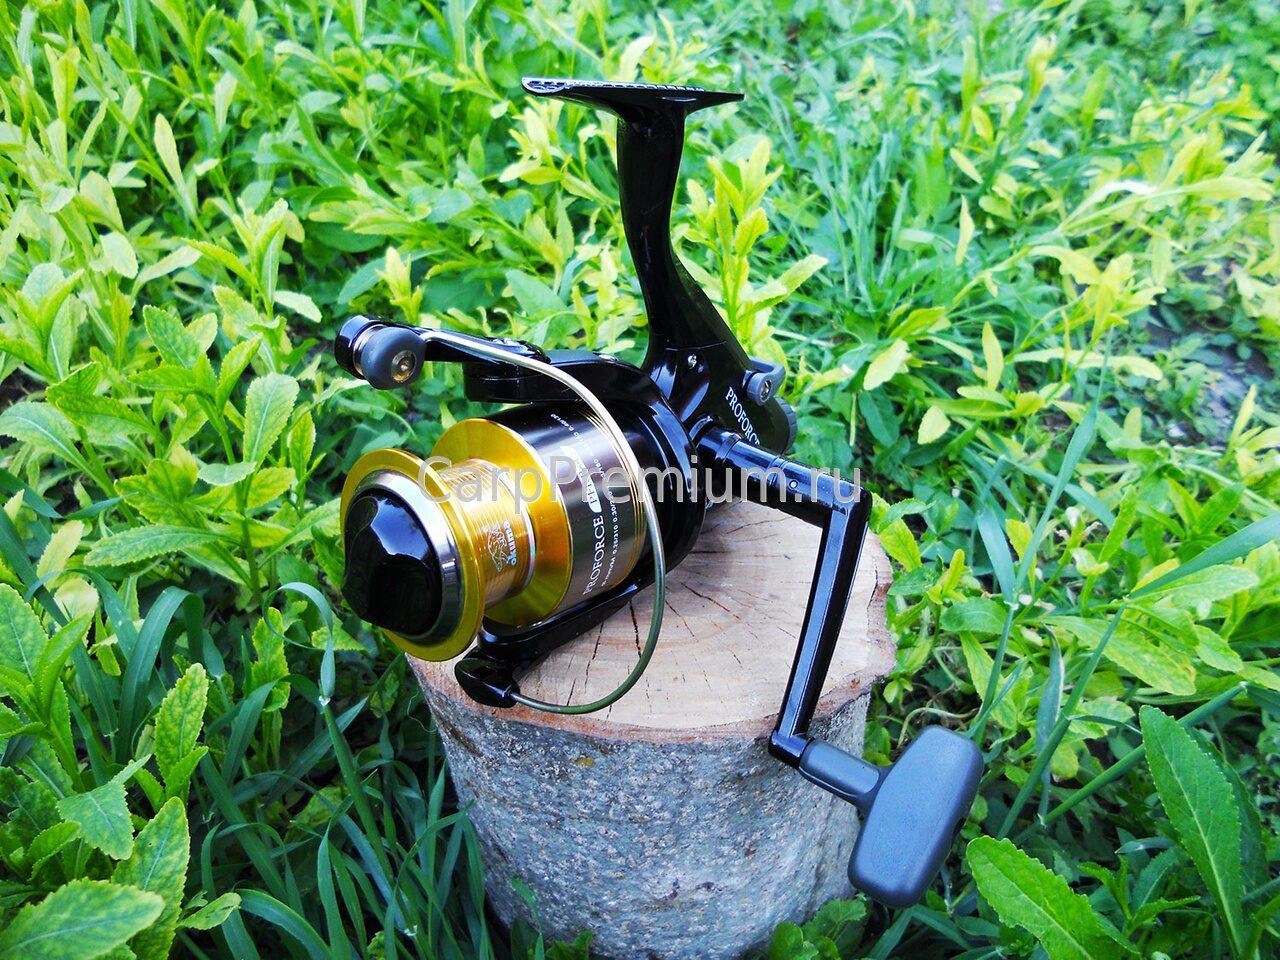 катушки с байтранером для ловли карпа